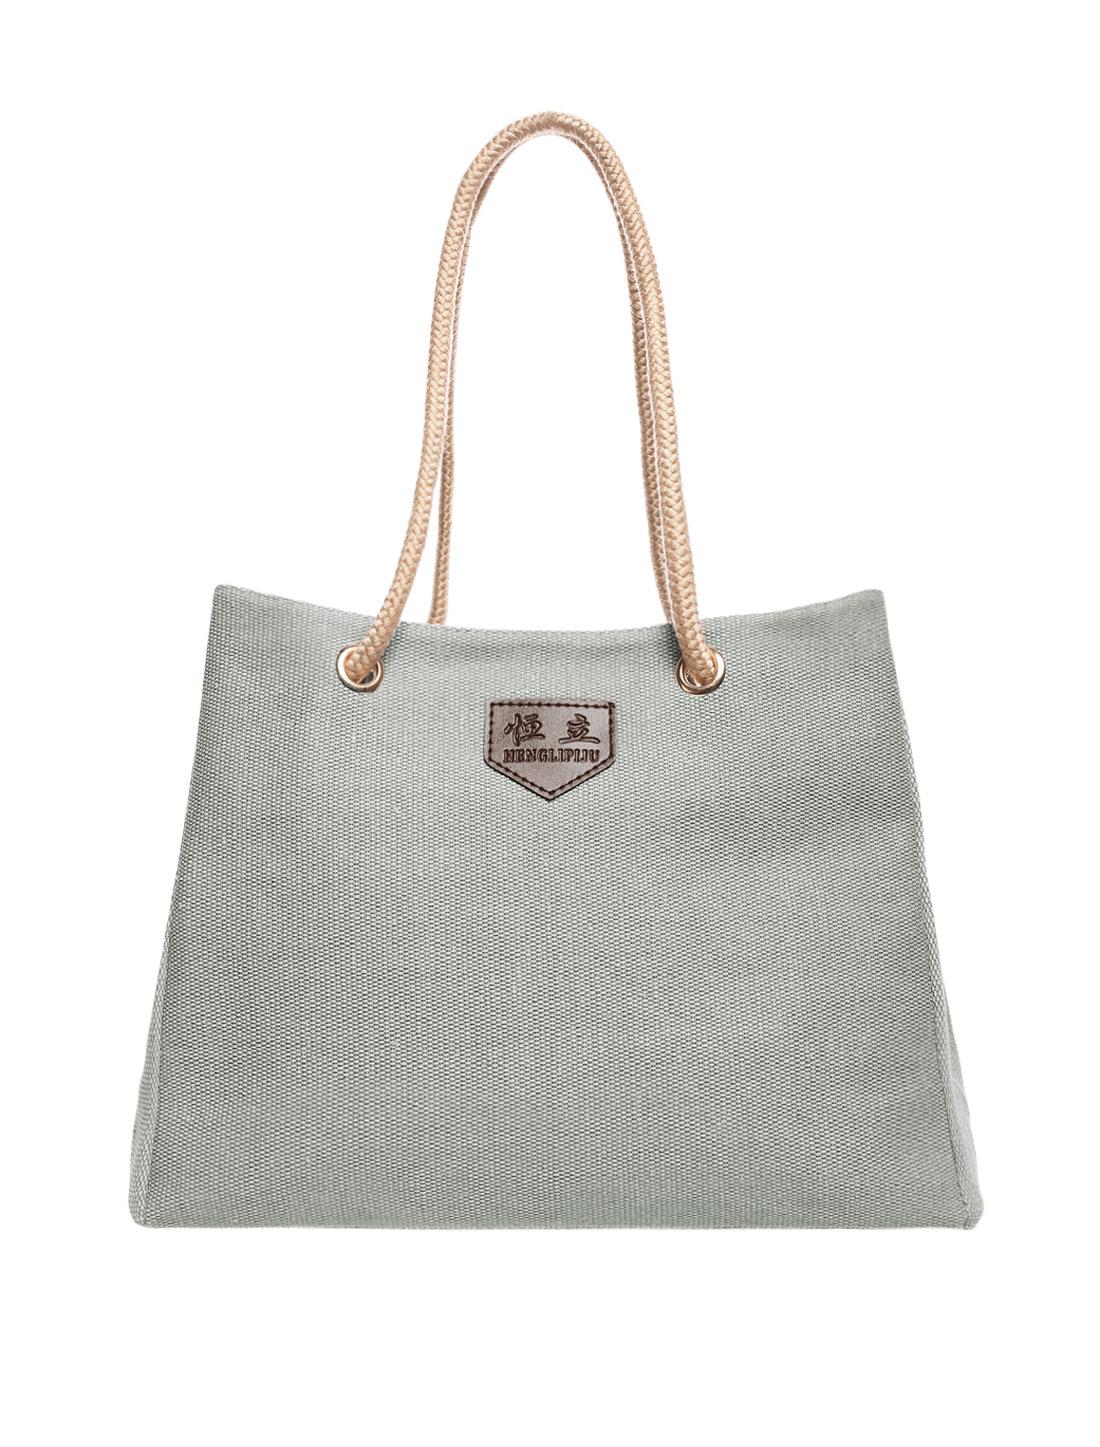 Women Canvas Handbag Messenger Shopping Tote Purse Satchel Shoulder Bag Gray